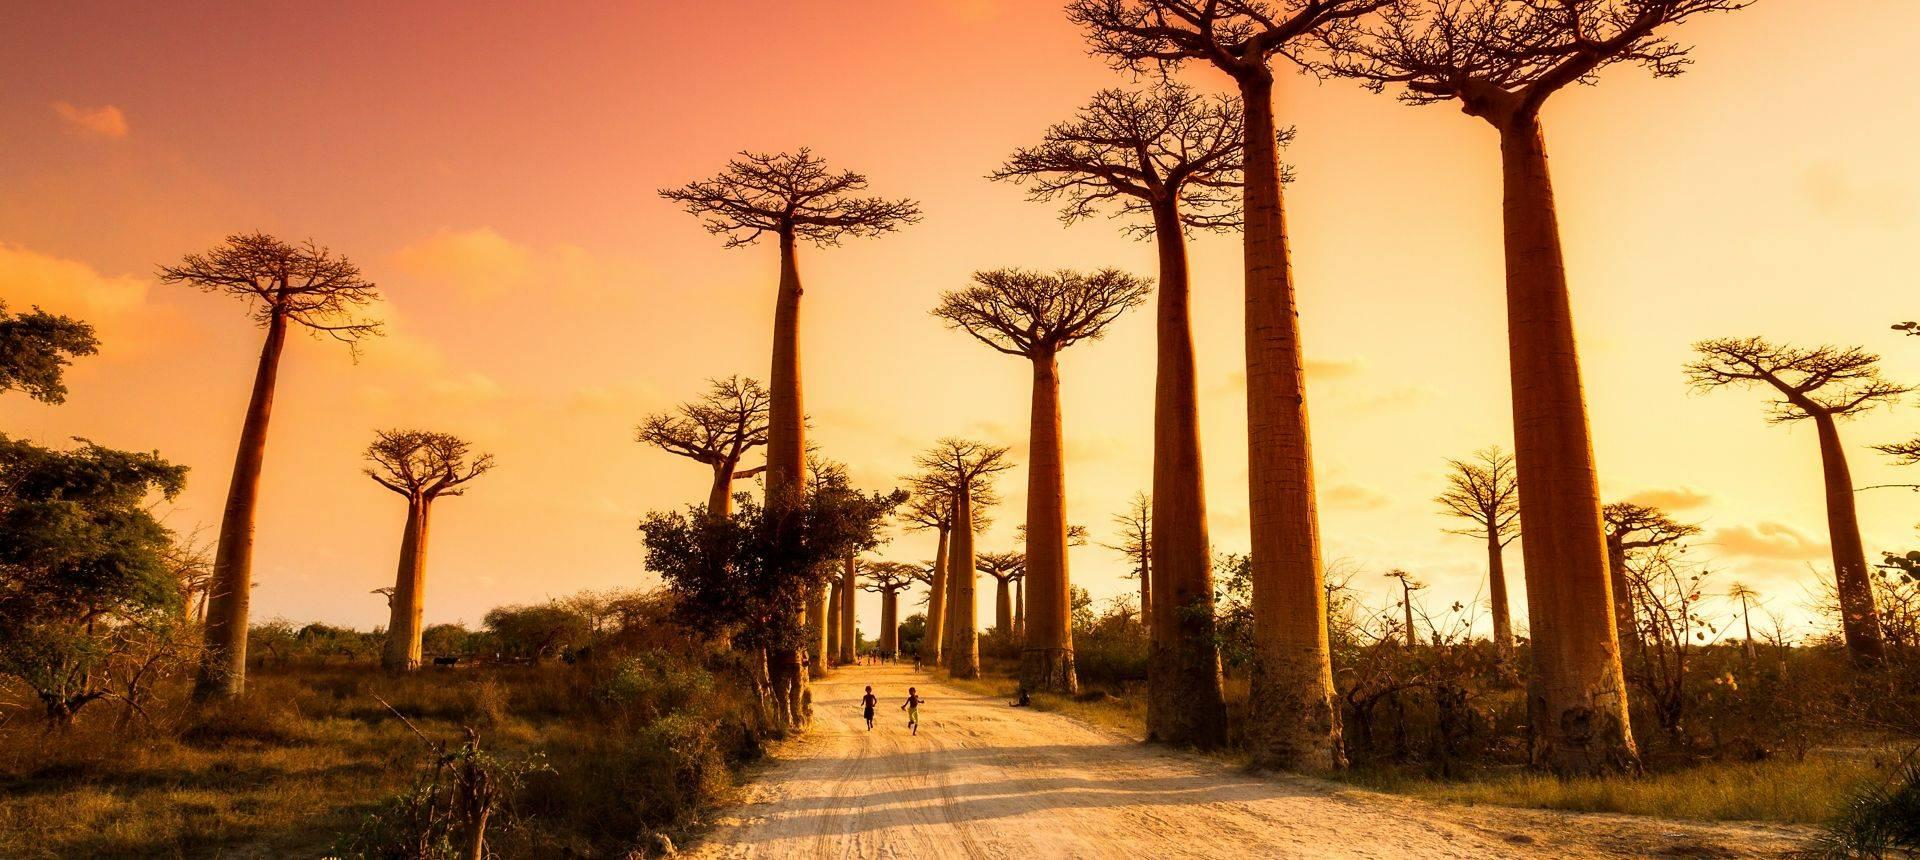 Avenue Of Baobabs Shutterstock 259688654